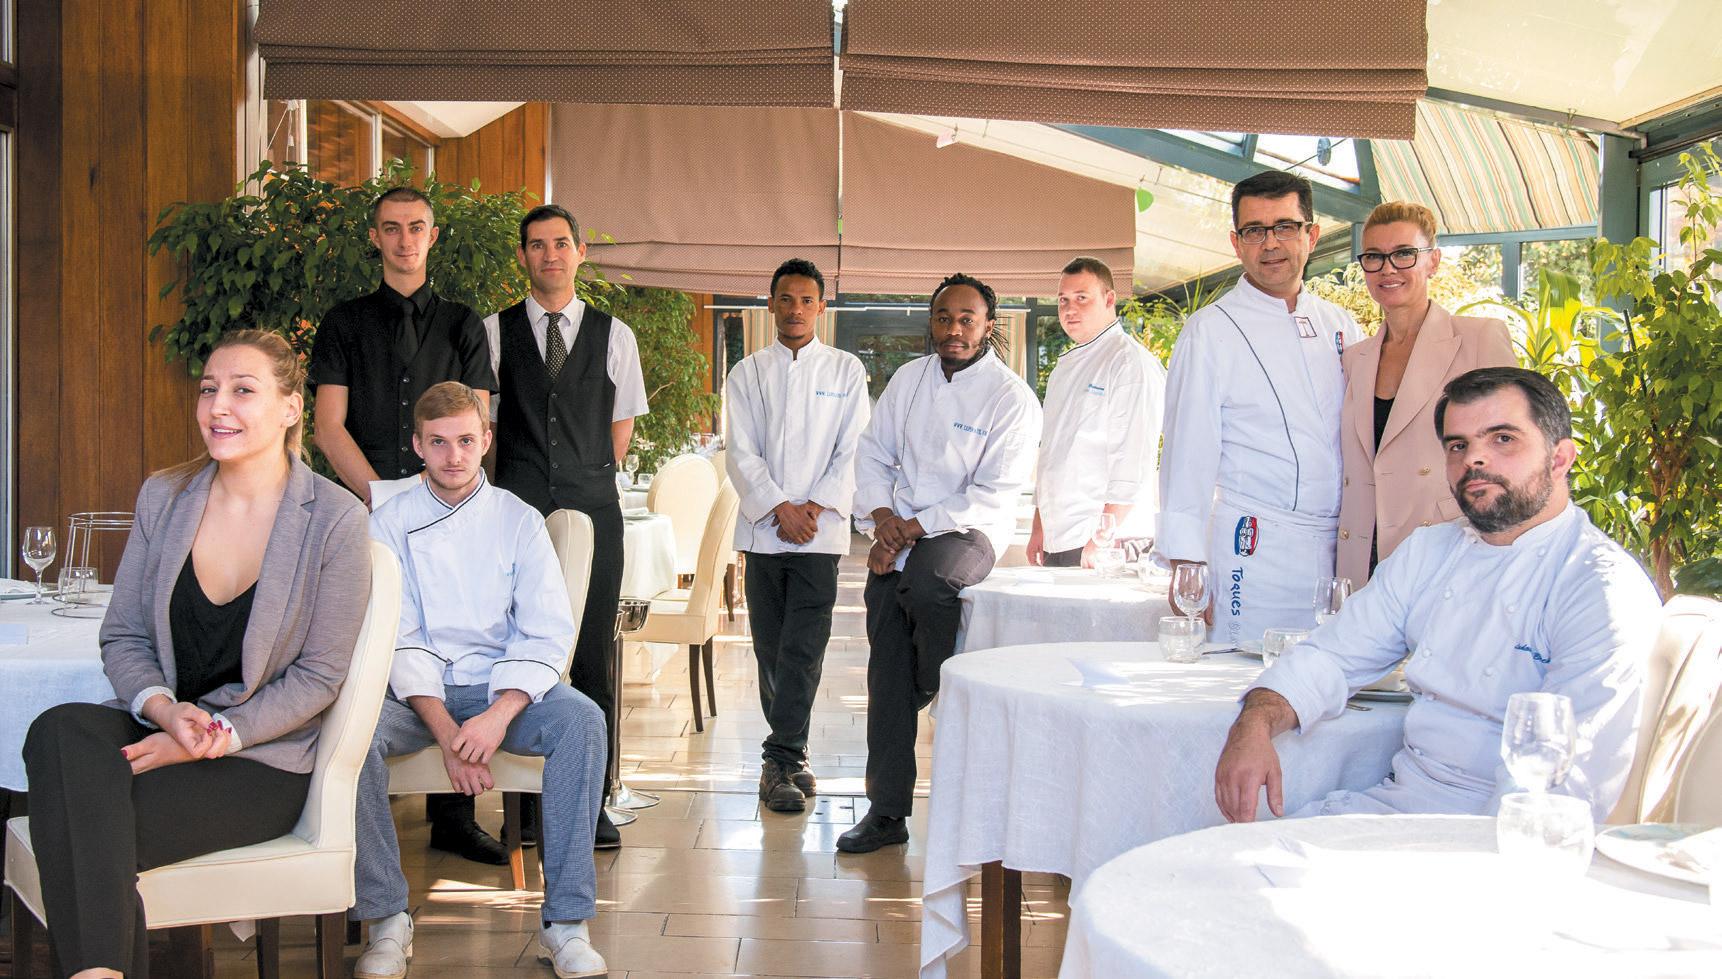 Restaurant Le Pirate - Pierre Franck Salamon